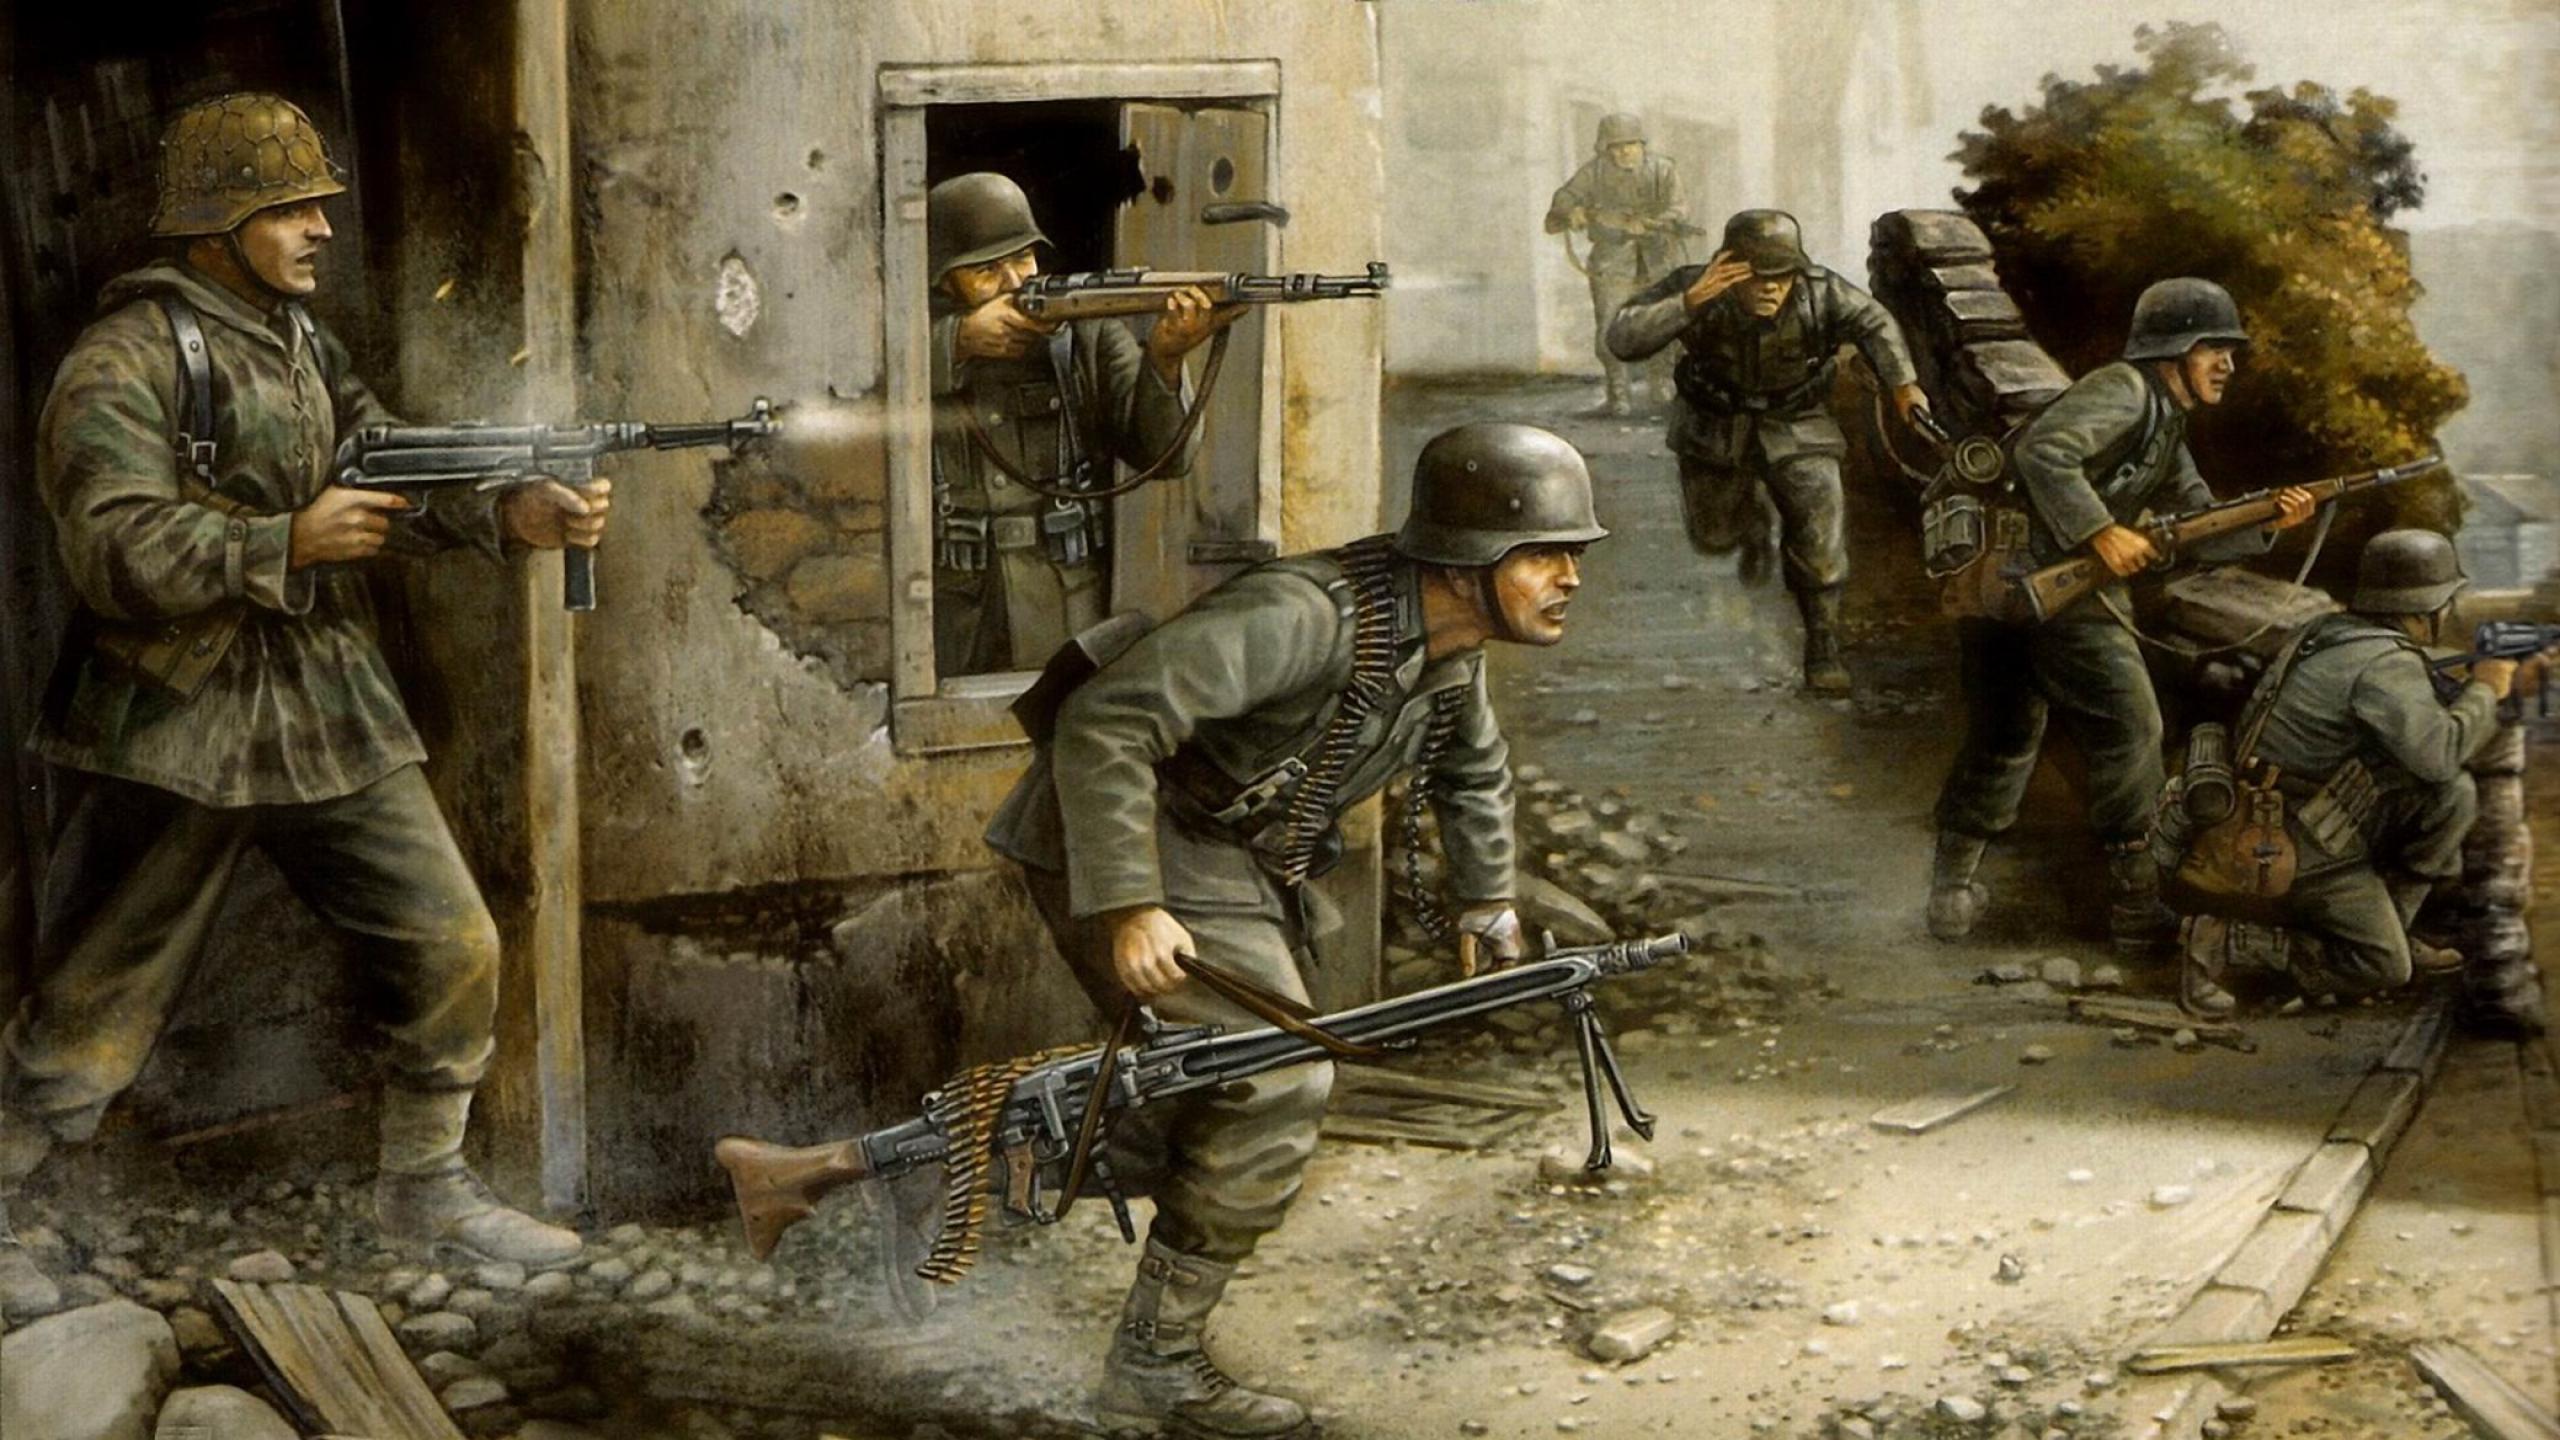 ww2 german army wallpaper - photo #10